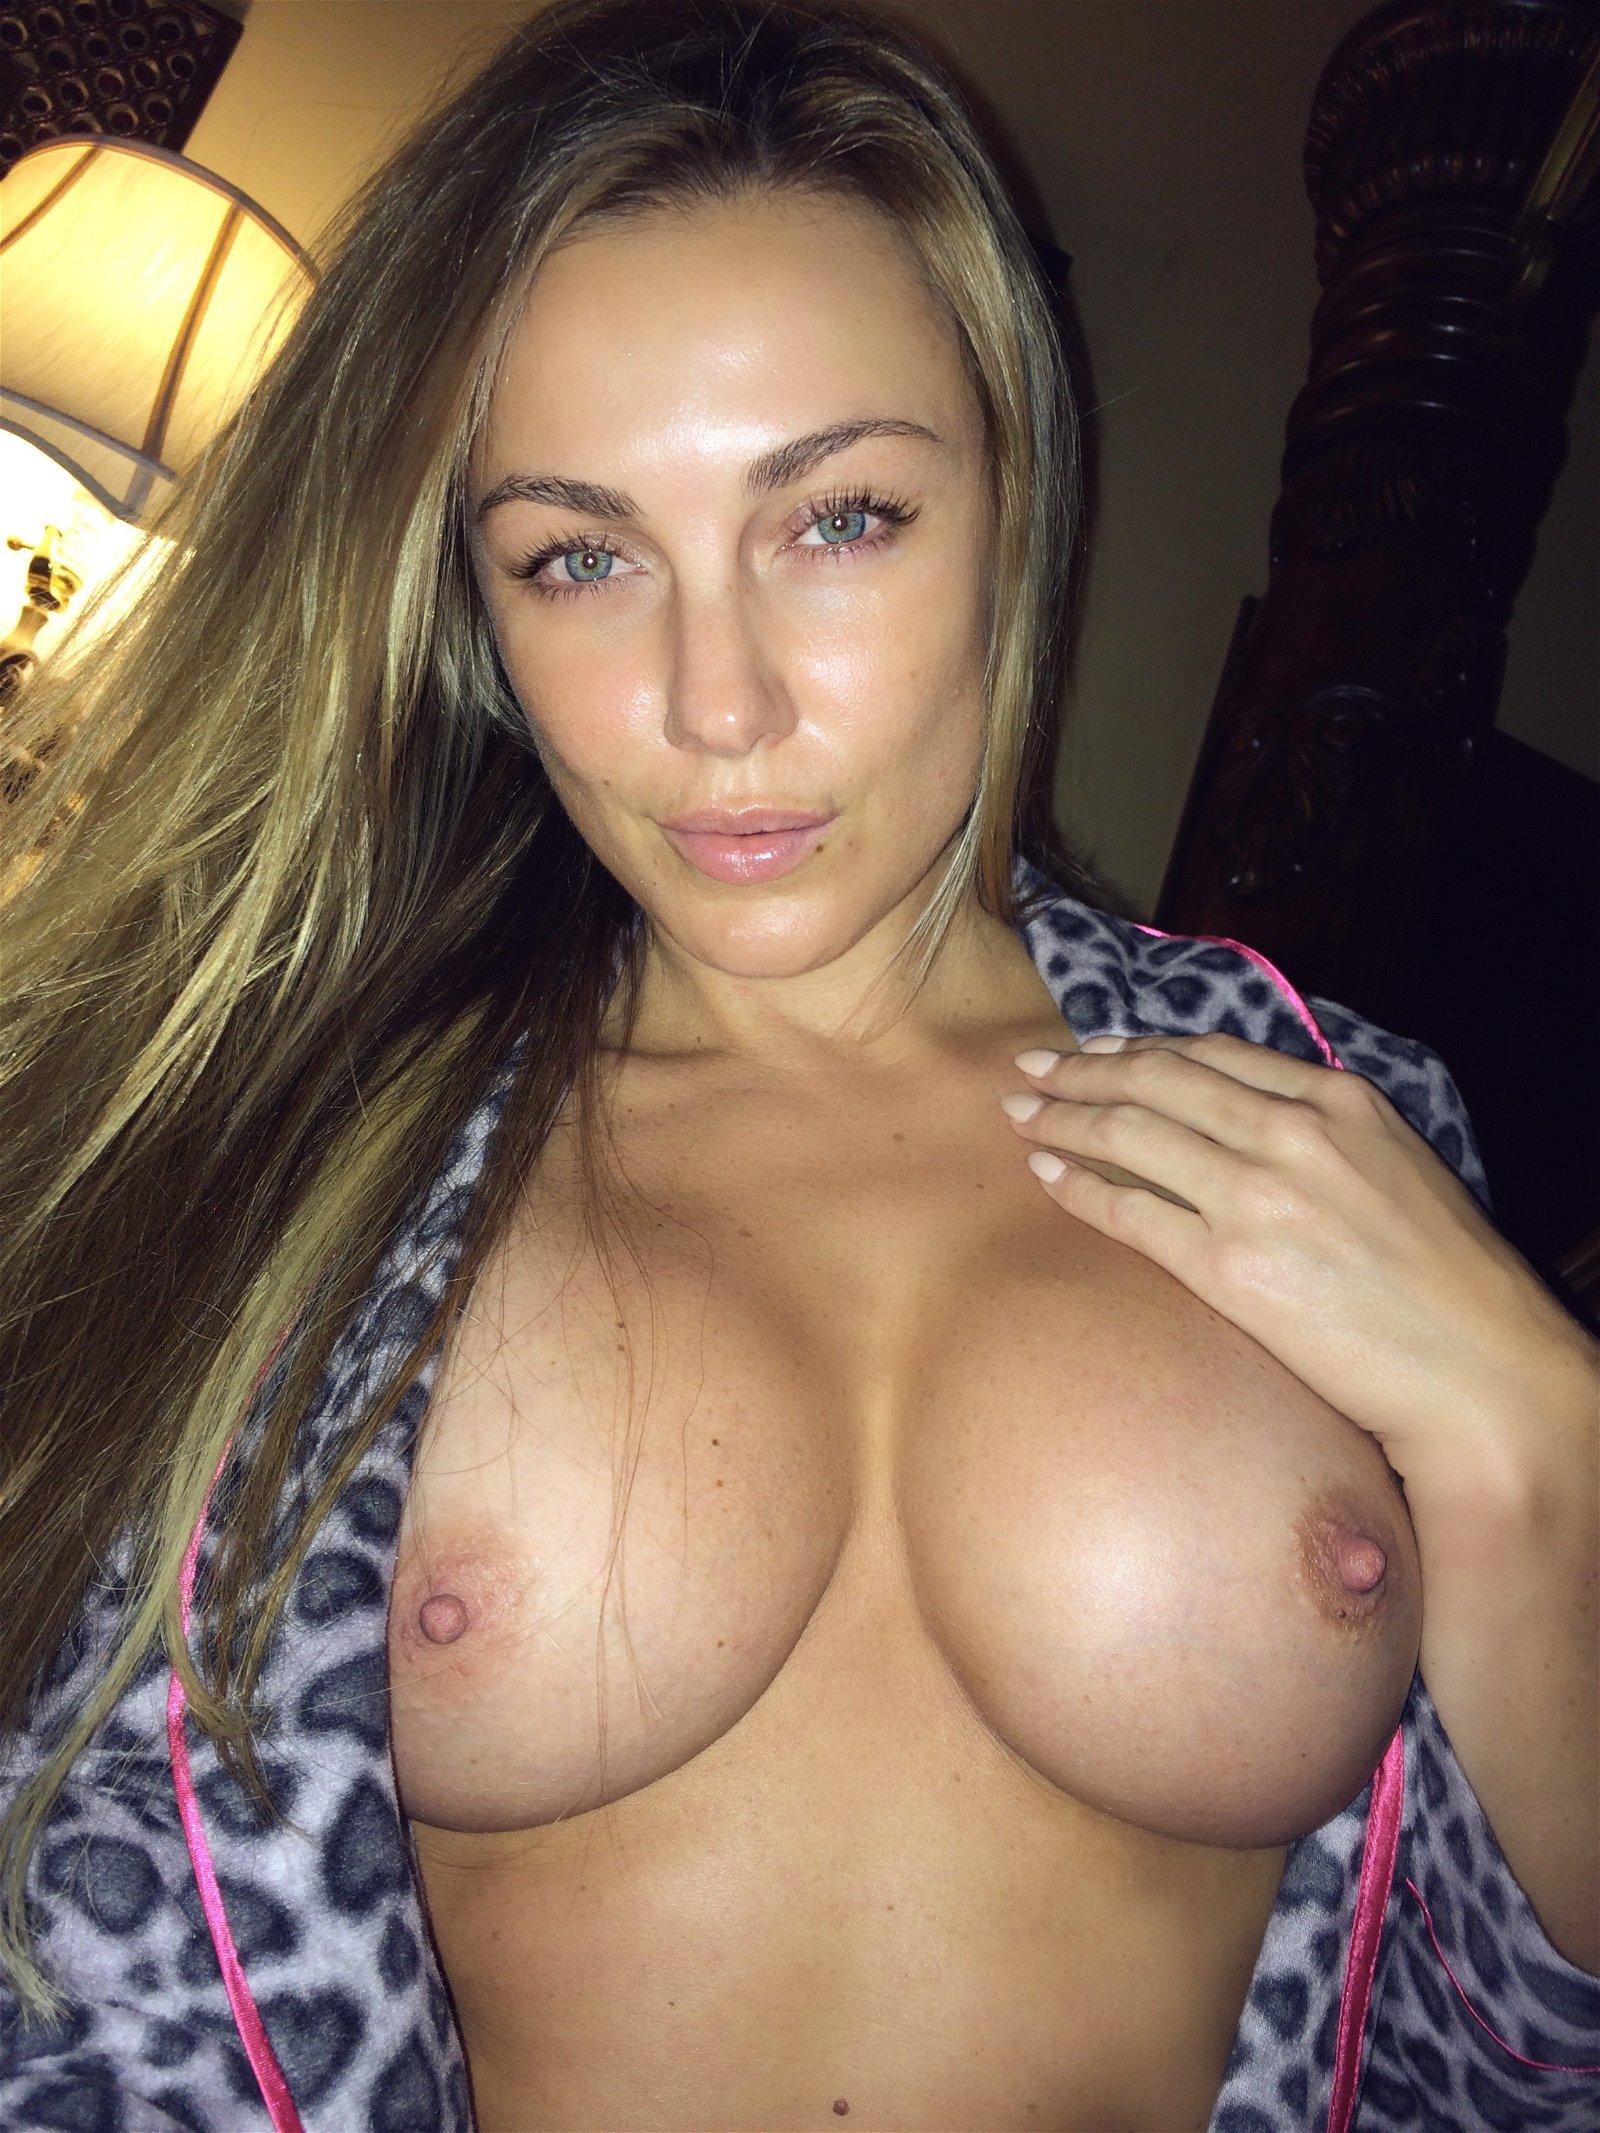 Amber Nichole topless pic